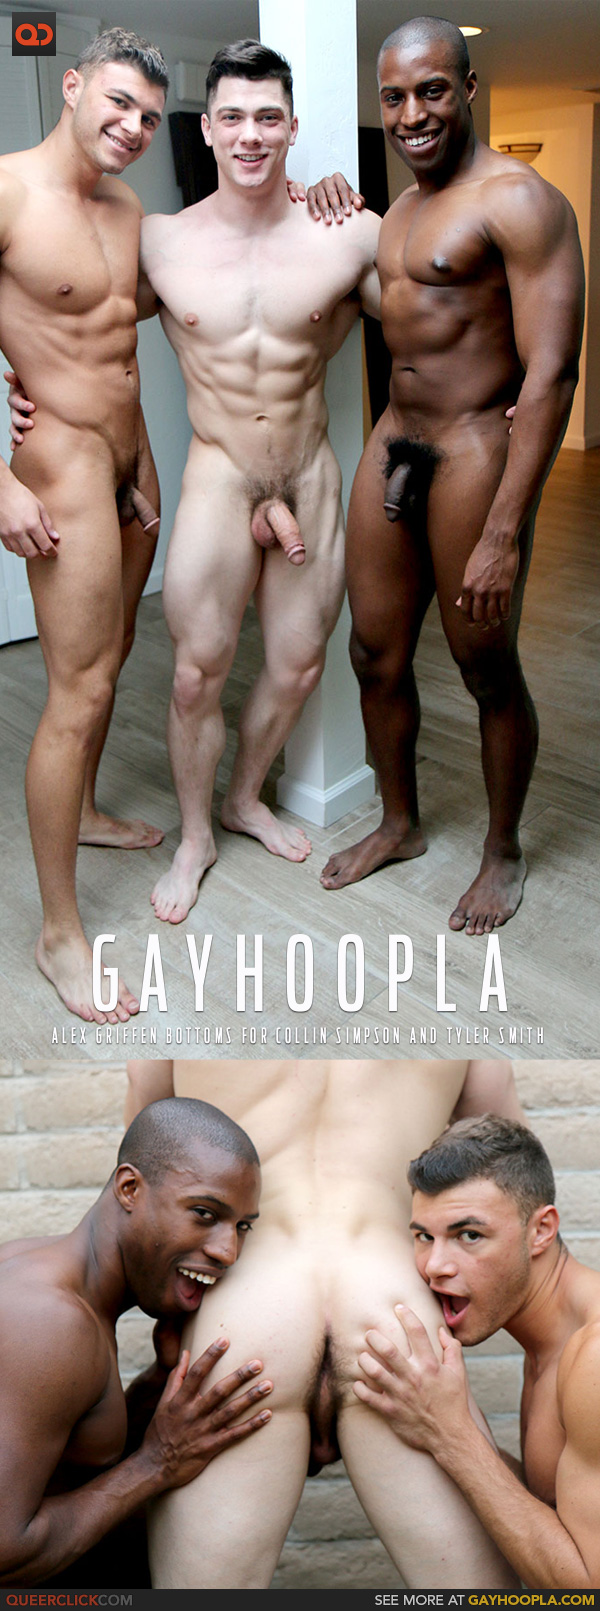 Richard hammond gay